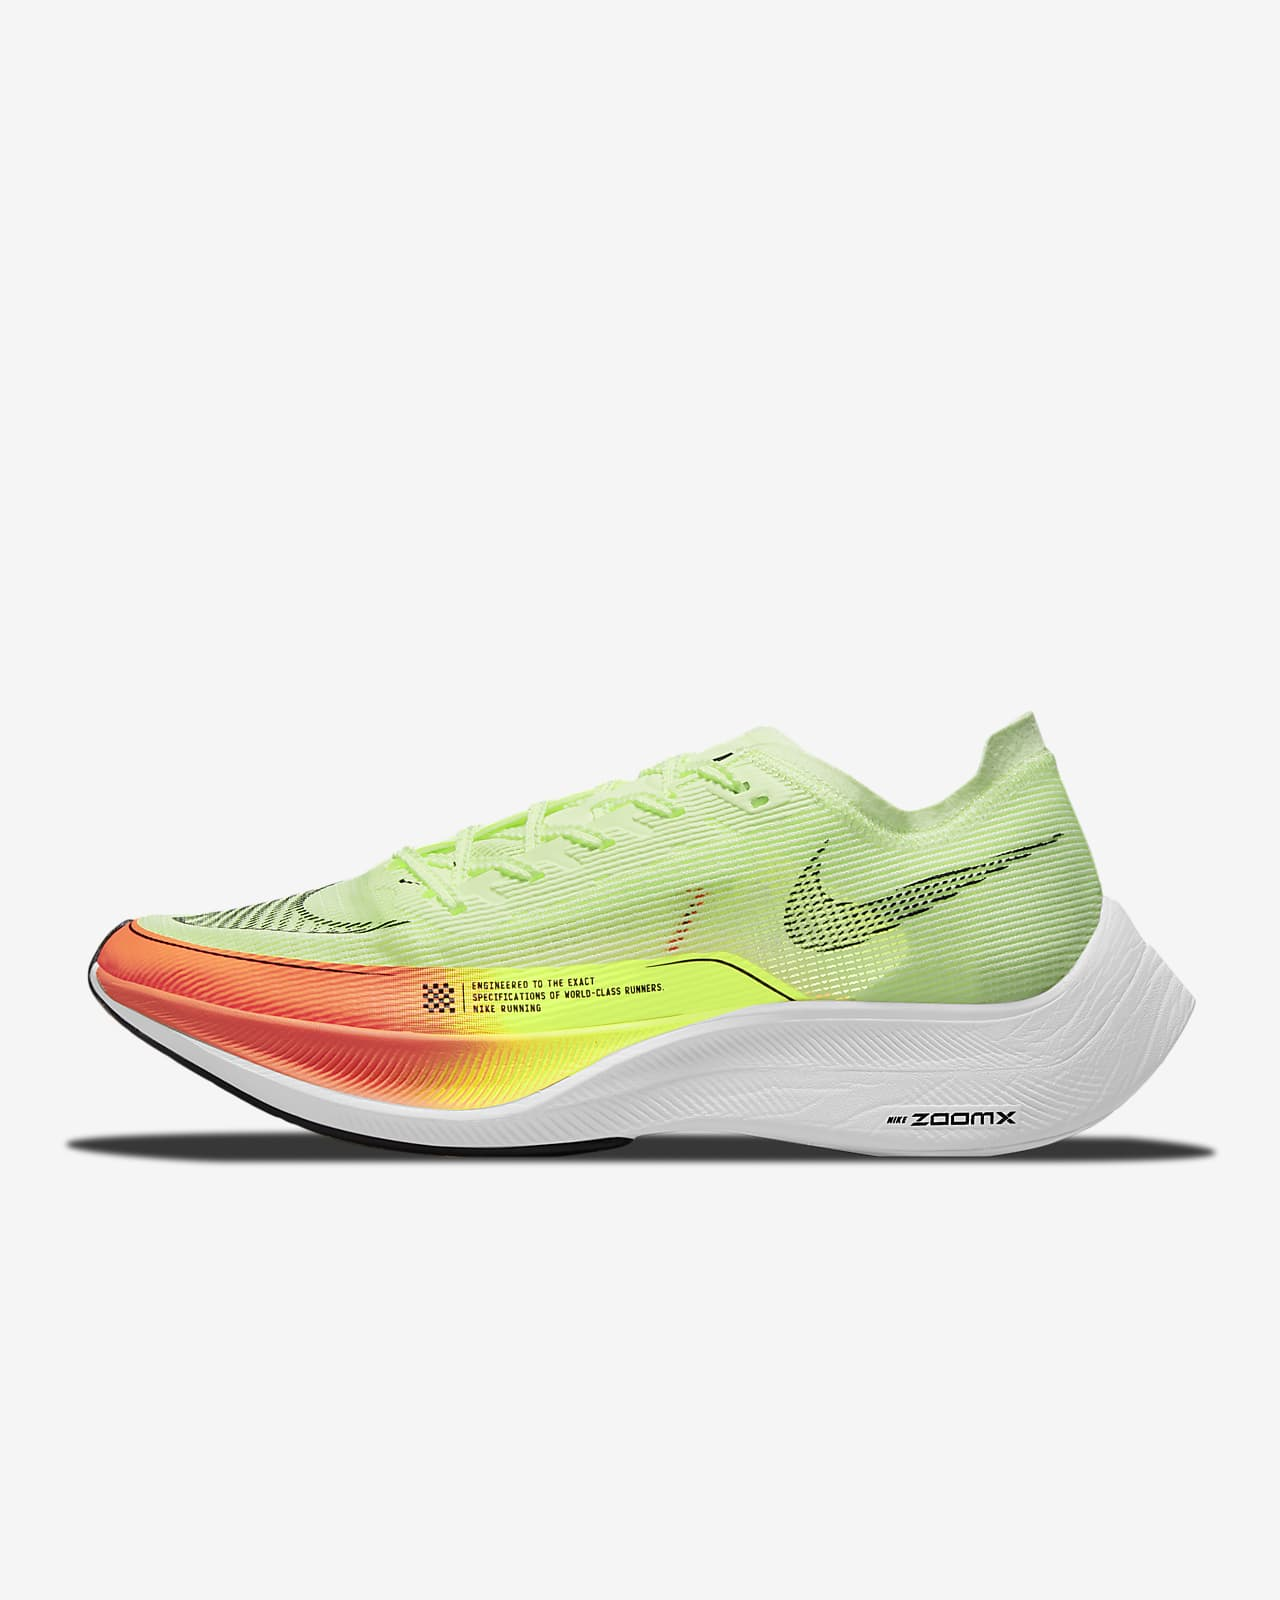 Мужские кроссовки для забегов Nike ZoomX Vaporfly Next% 2